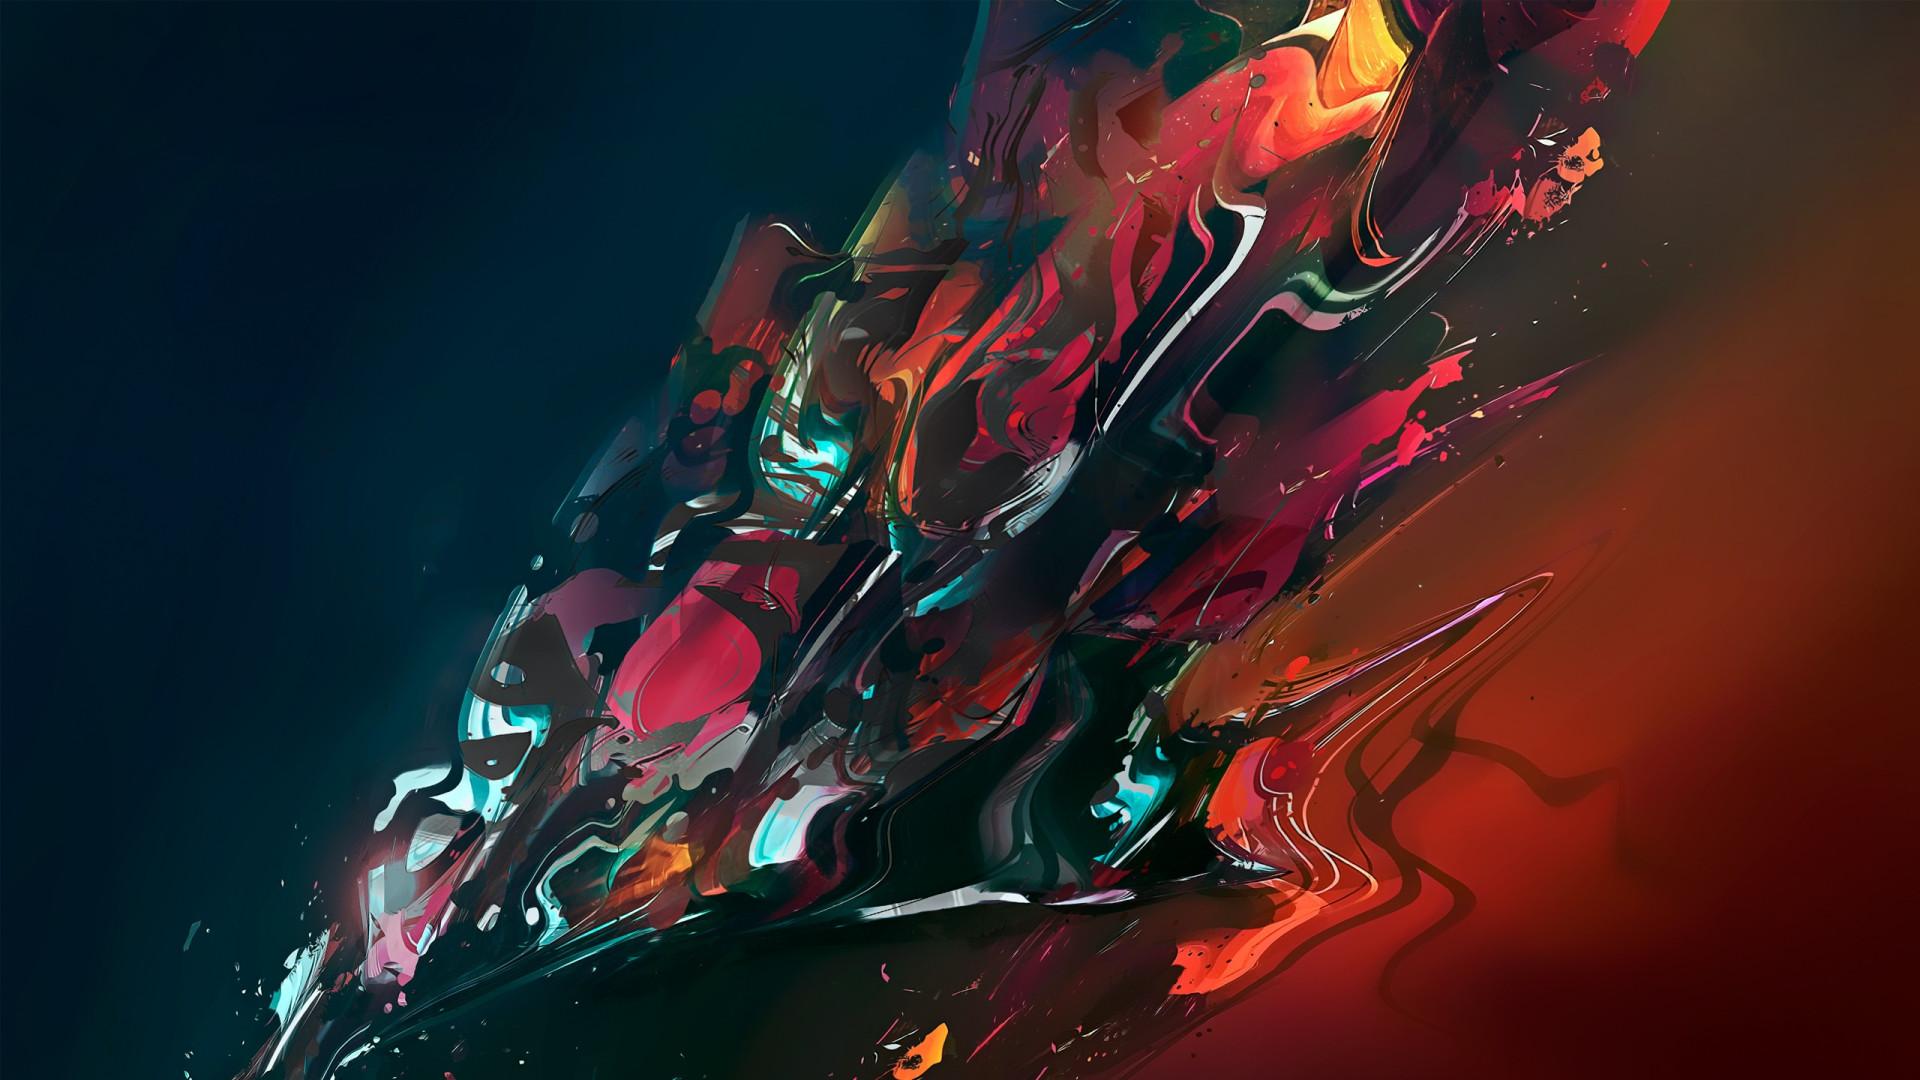 Abstract Color Cgi Painting Art Wallpaper At 3d Wallpapers